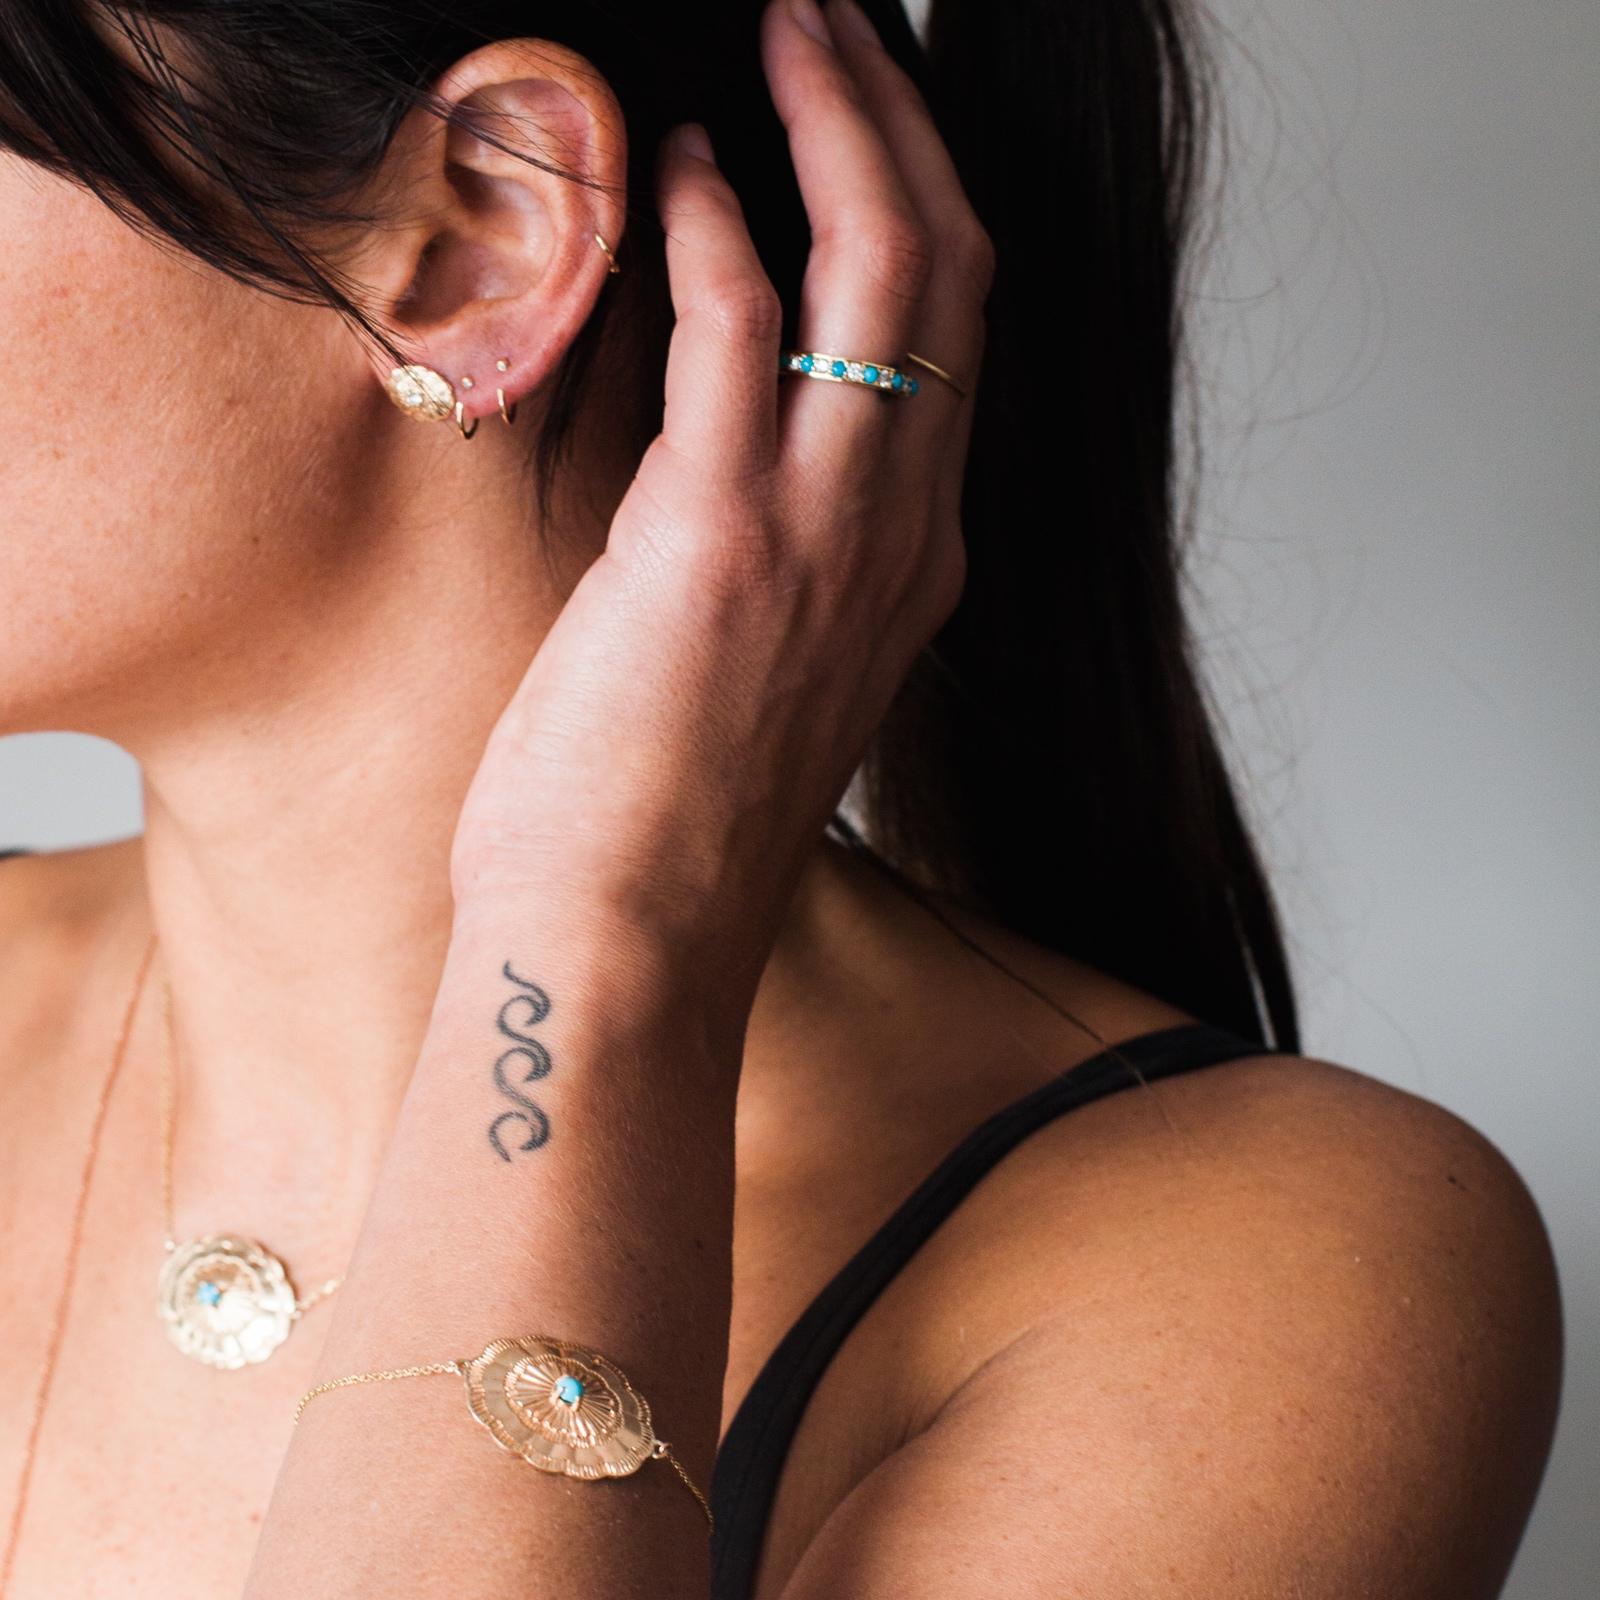 bracelets and earrings 1.jpg